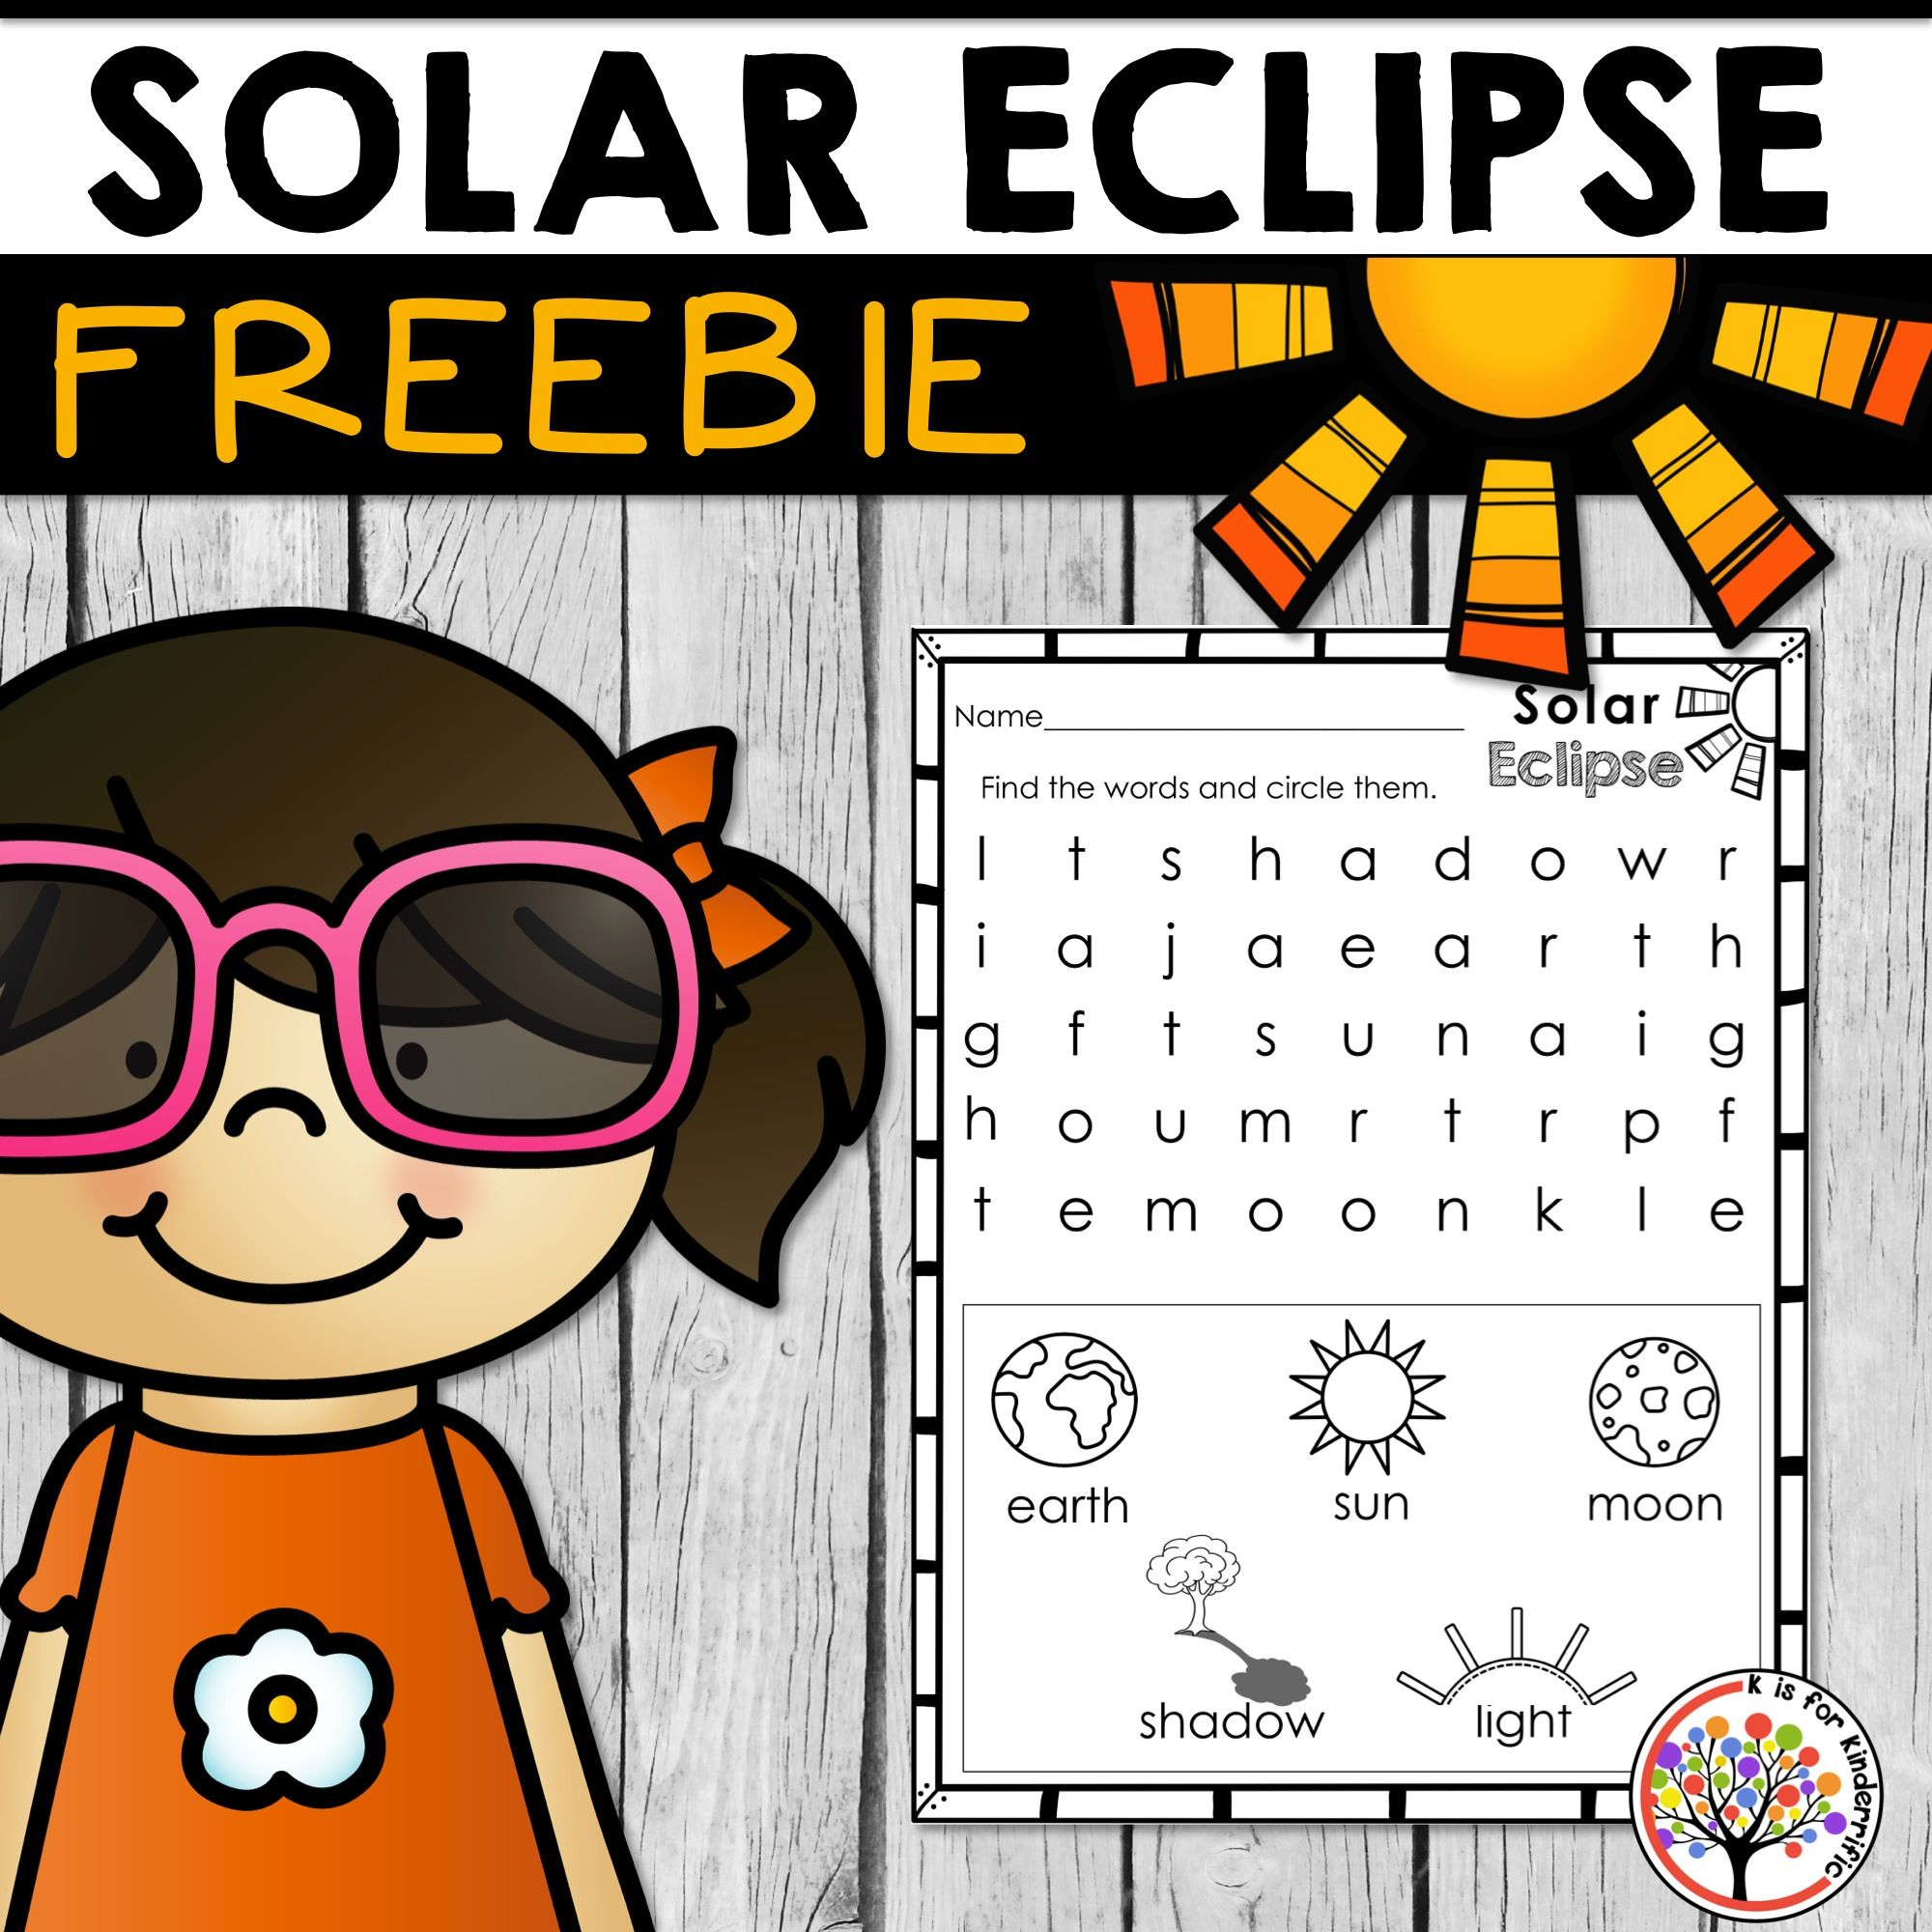 Solar Eclipse Freebie